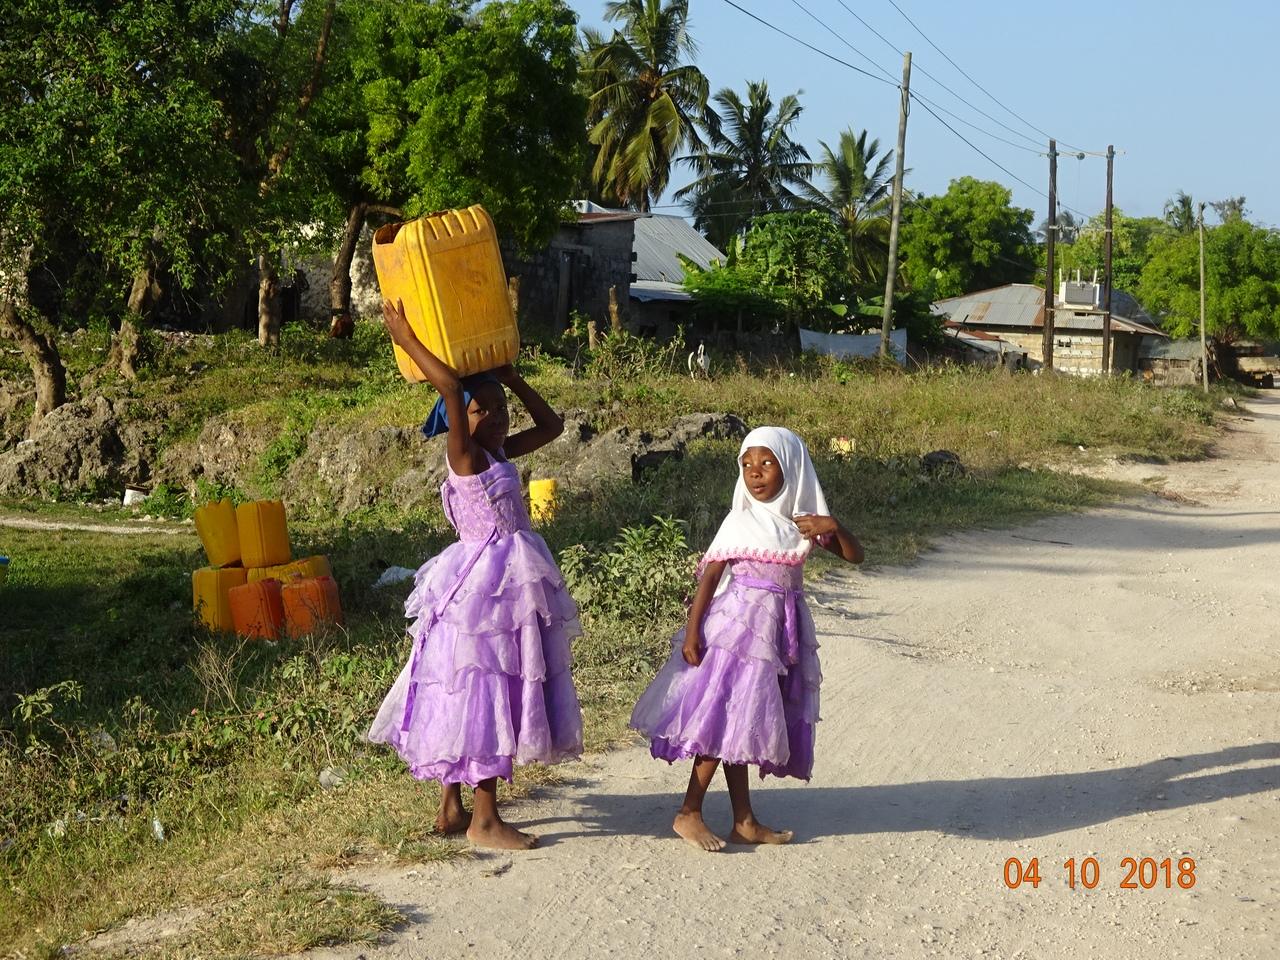 Наши невероятные приключения на Занзибаре и в Танзании( о. Занзибар, г Дар-эс-Салам,г Аруша, сафари в парках Тарангире, Нгоронгоро, Серенгети,Маньяра)